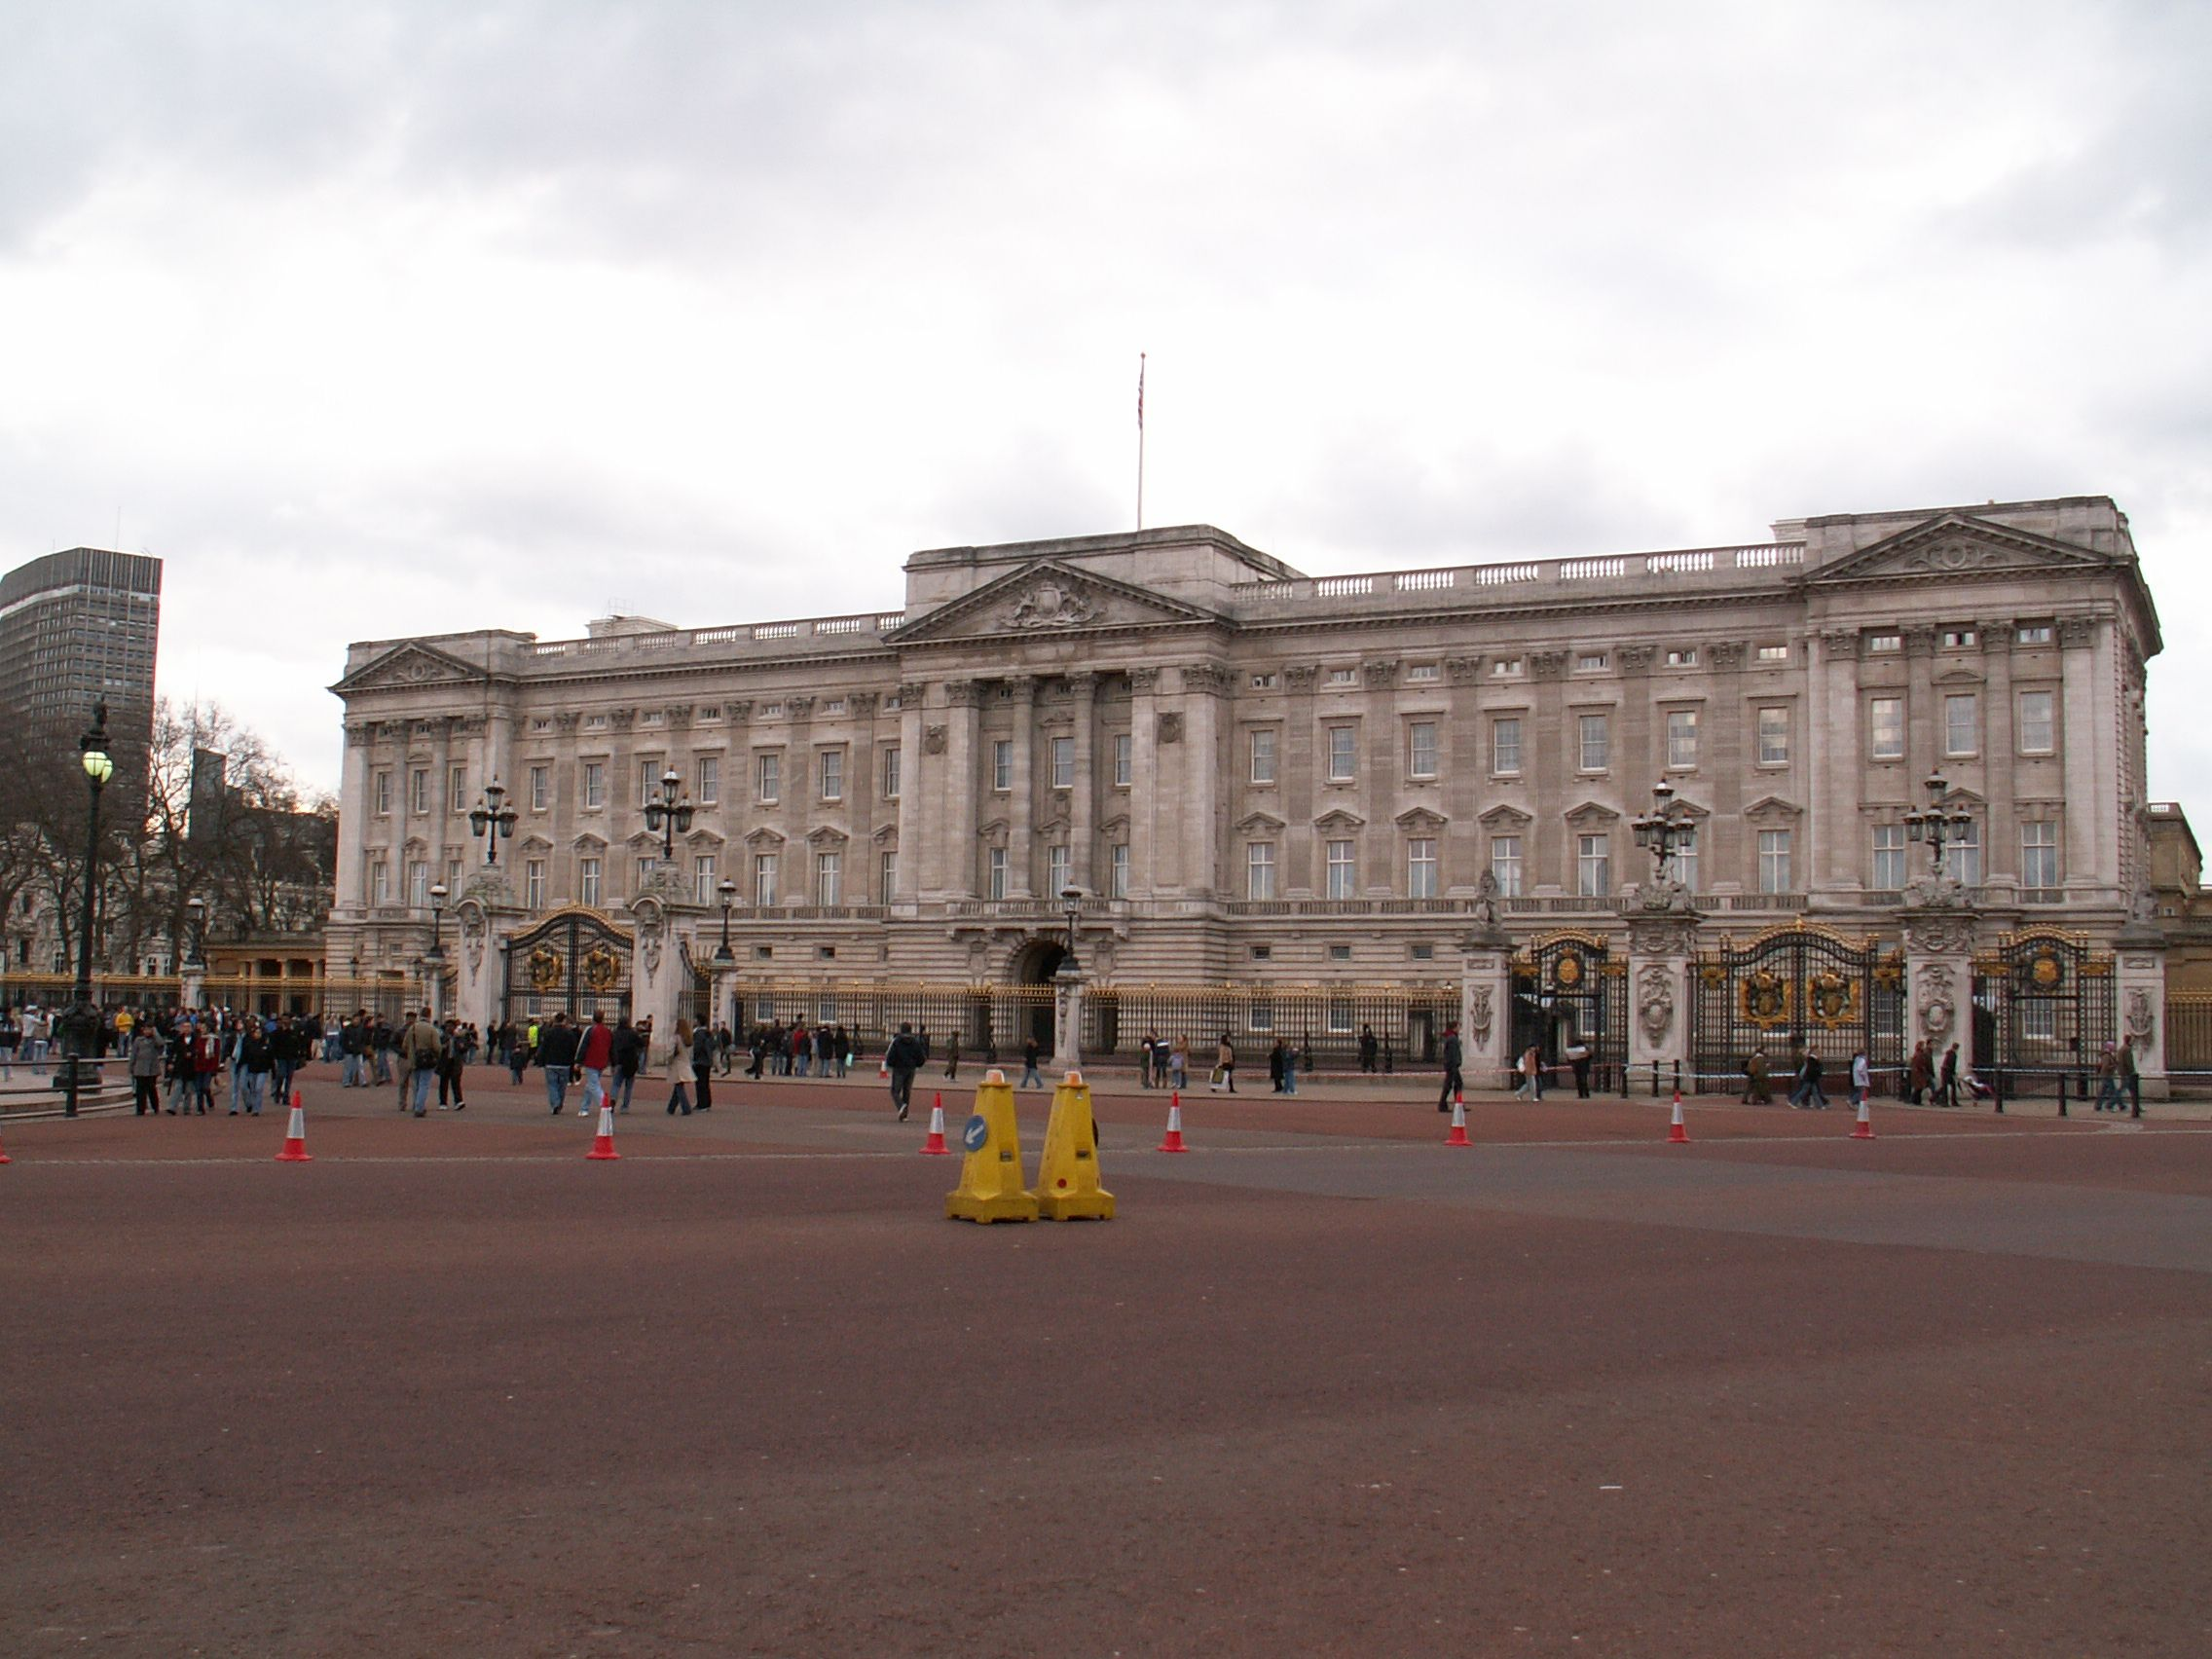 Das beliebte Touristenziel Buckingham Palace liegt nahe dem Ort der Explosion    Foto:  GFDL , CC BY-SA 3.0